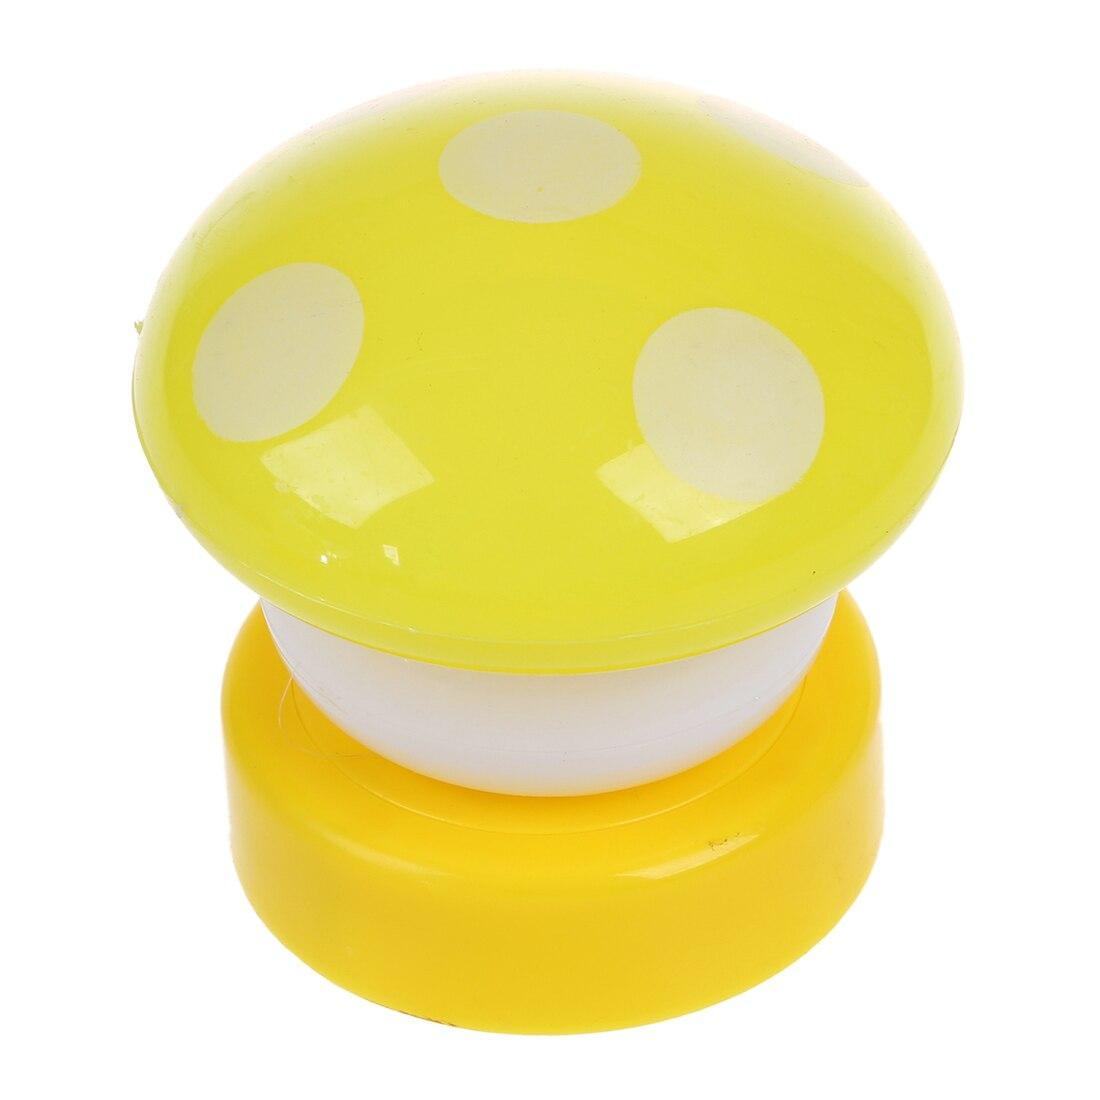 2 PCS Colourful Mushroom Push/Touch LED Childrens Bedroom Night Light Desk Lamp - Yellow